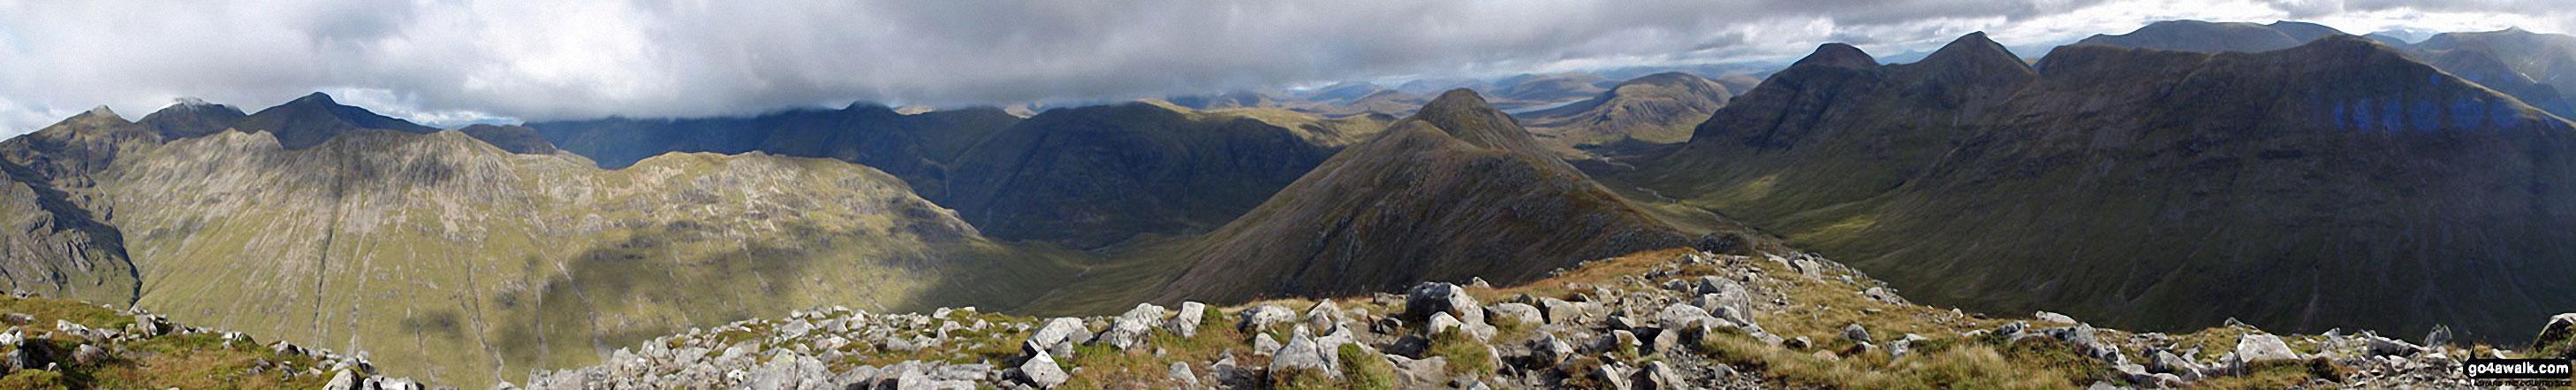 Stob Coire Sgreamhach (left) & Beinn Fhada (Stob Coire Sgreamhach) (foreground - left) with Bidean nam Bian & Stob Coire nam Beith (in shadow behind), Stob Coire Raineach (Buachaille Etive Beag) (centre), Buachaille Etive Mor (Stob Dearg), Stob na Doire (Buachaille Etive Mor), Stob Coire Altruim (Buachaille Etive Mor) & Stob na Broige (Buachaille Etive Mor) (right) with Clach Leathad (Creise), Creise & Stob A' Ghlais Choire (Creise) behind from the summit of Buachaille Etive Beag (Stob Dubh)